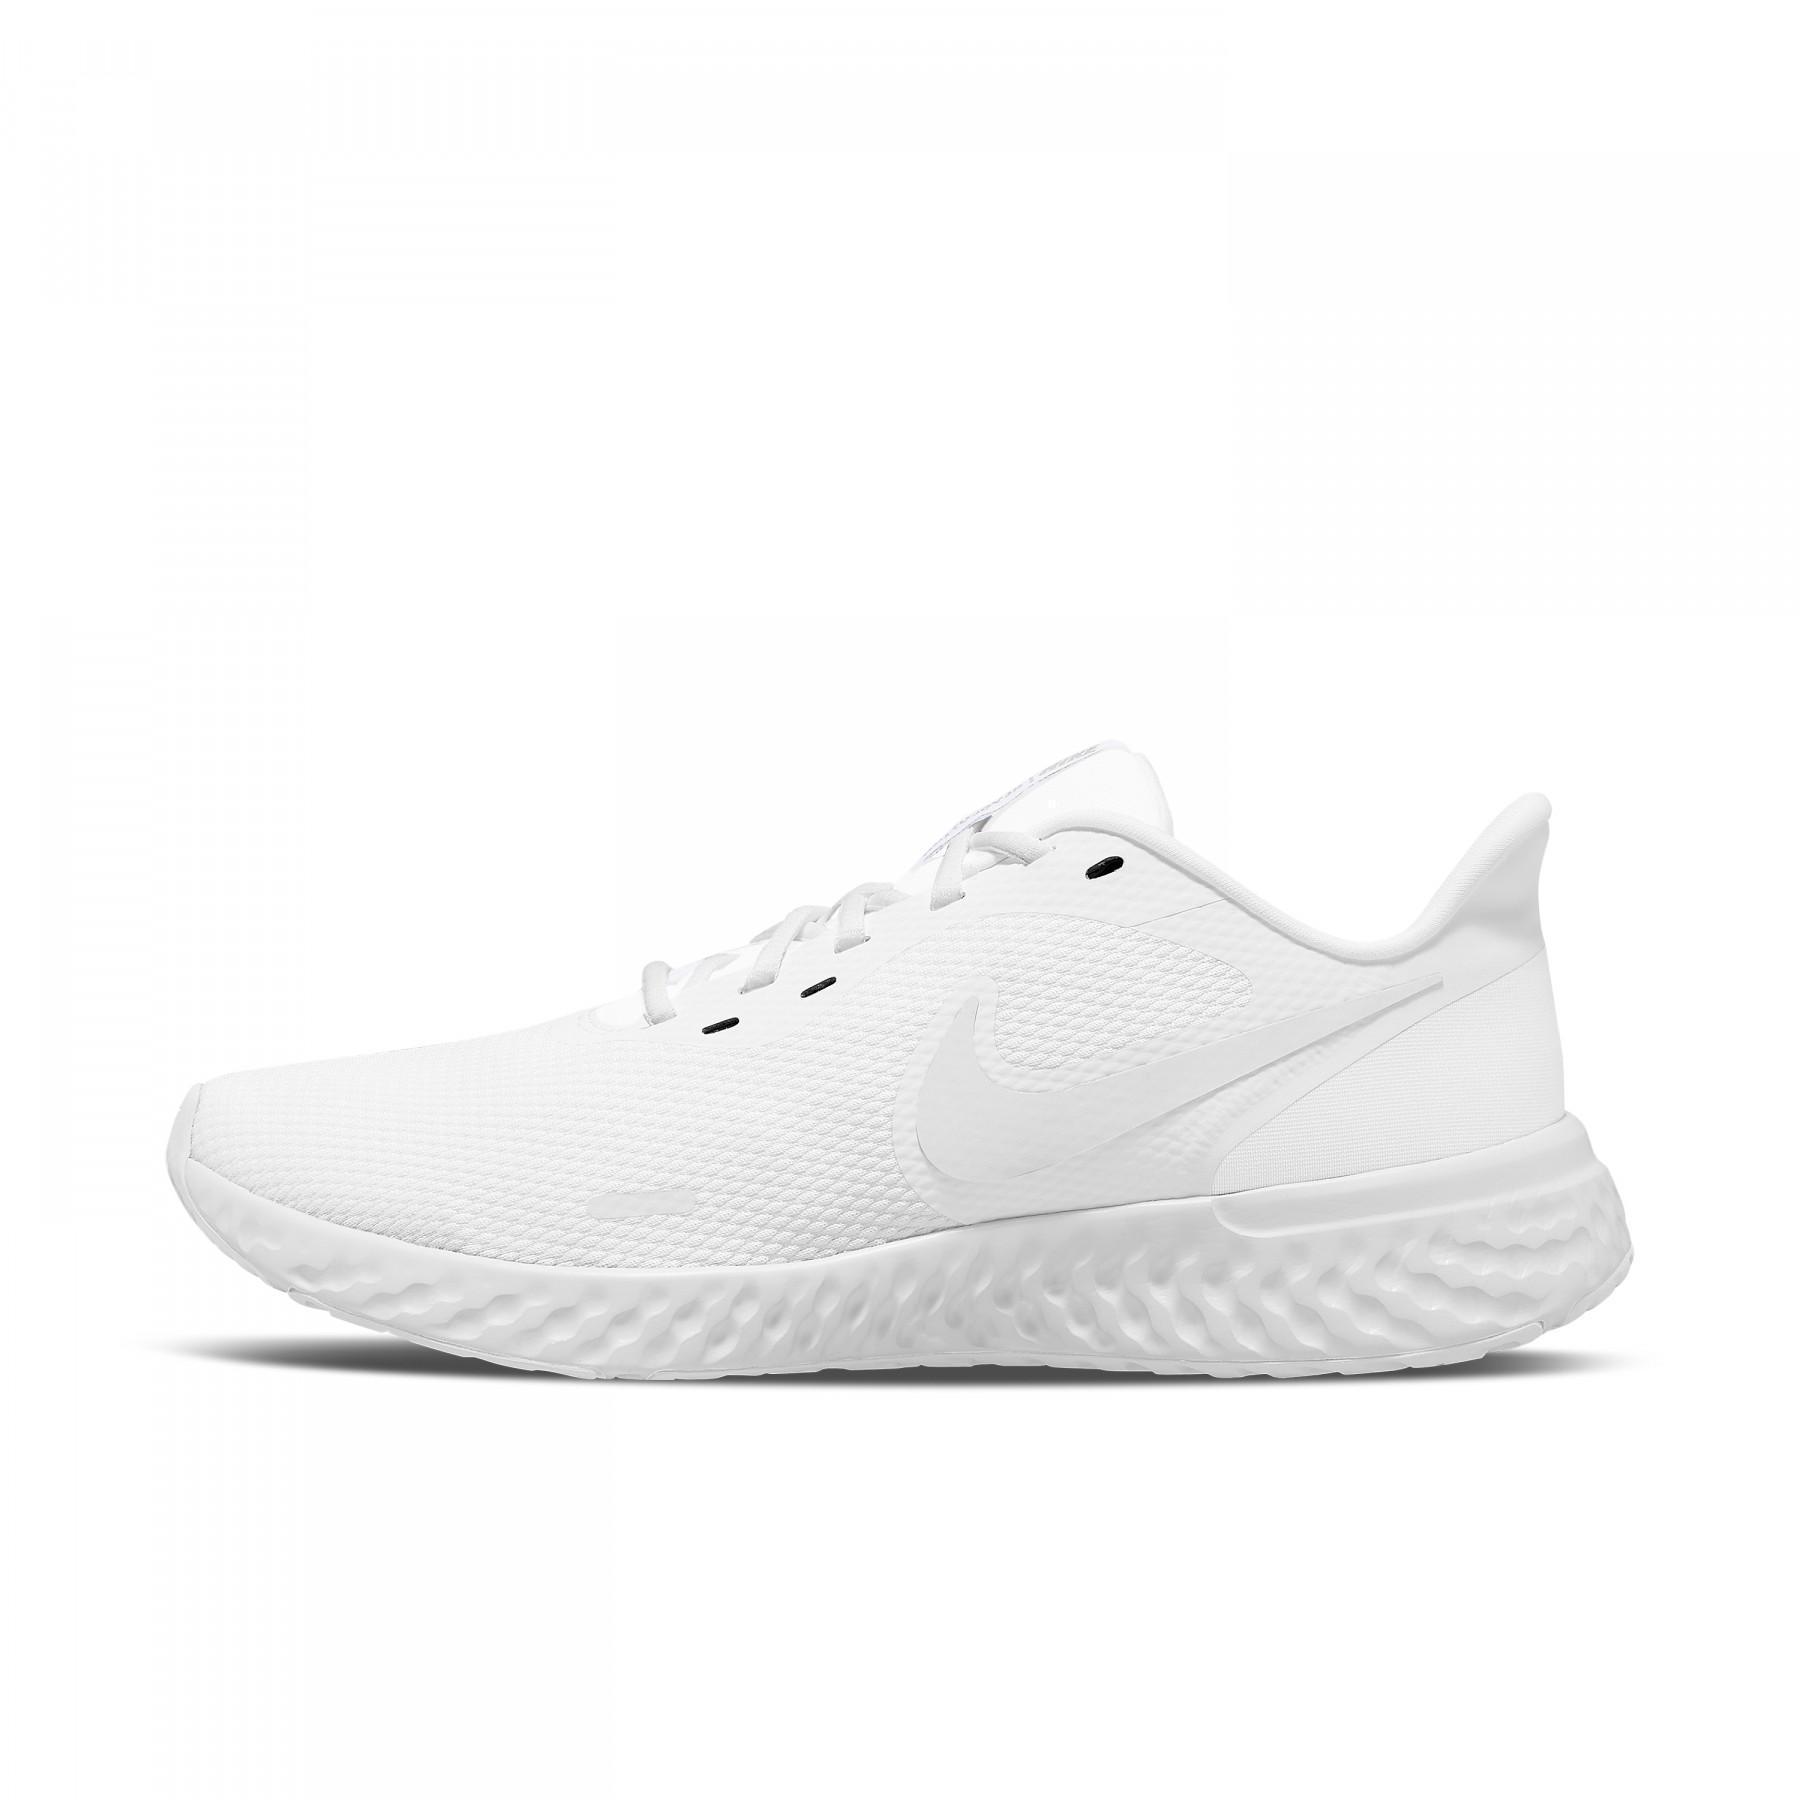 Shoes Nike Revolution 5